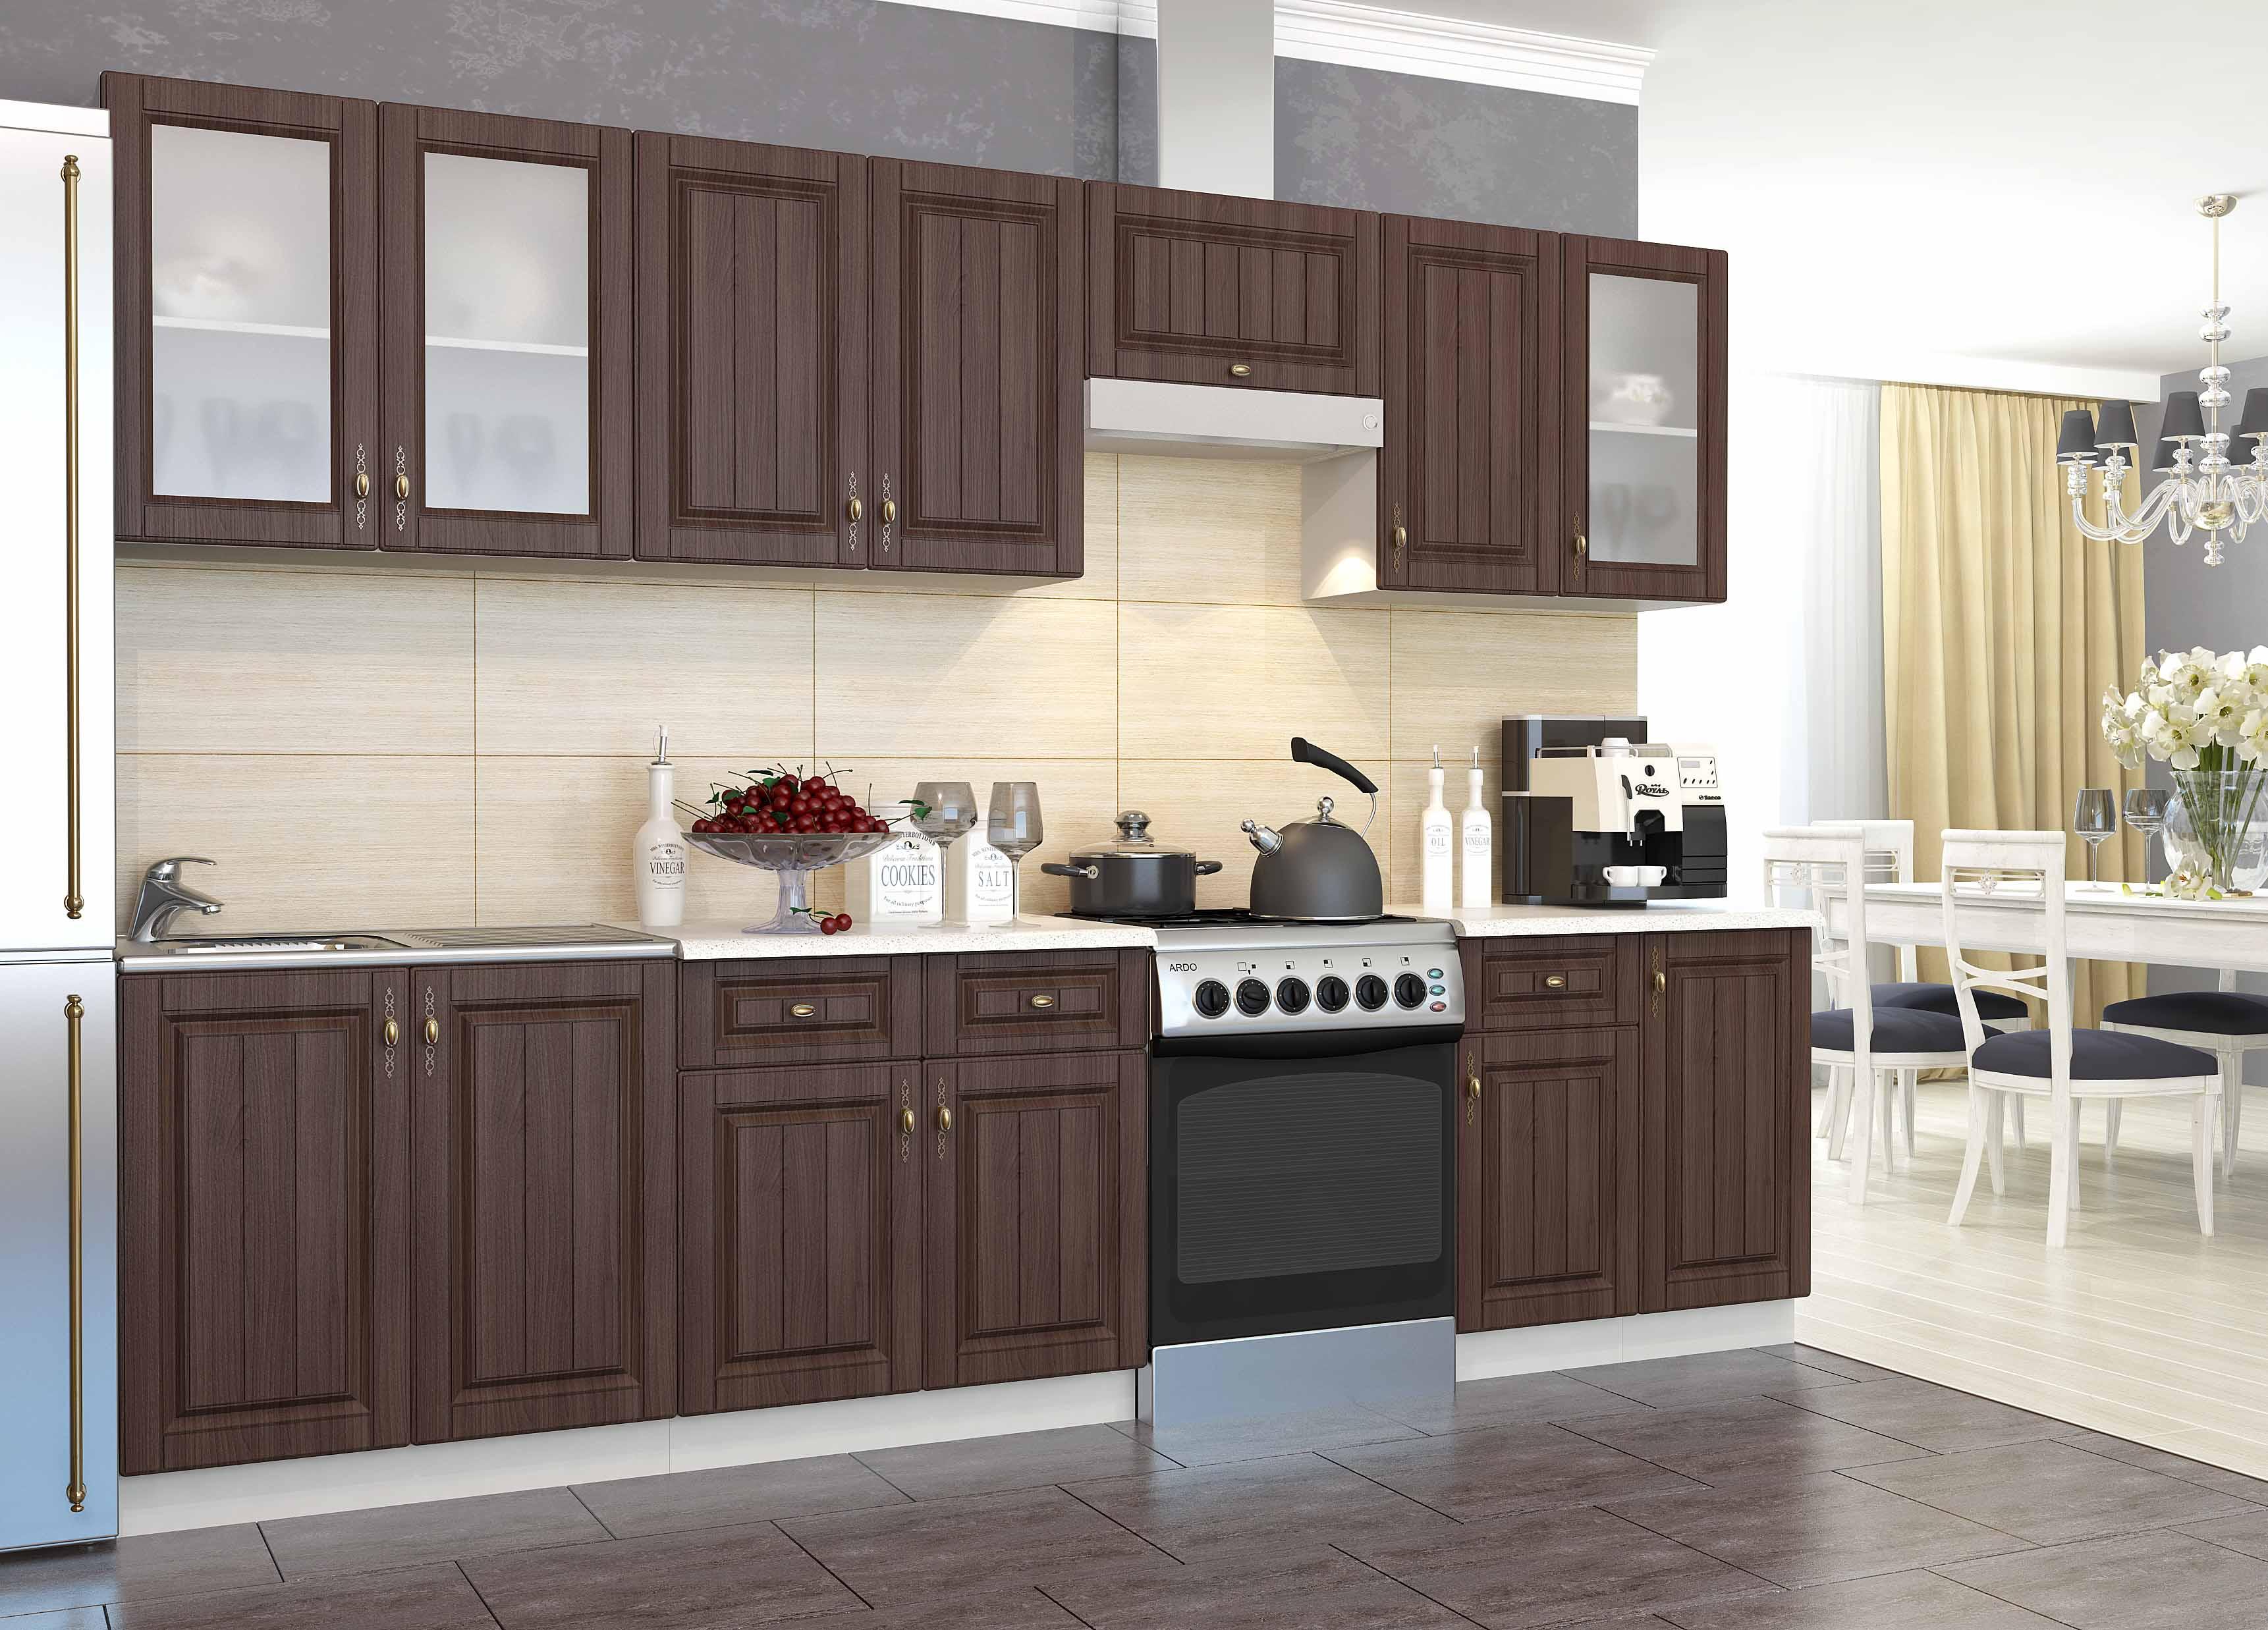 Кухня Империя CМ 600 Шкаф нижний мойка